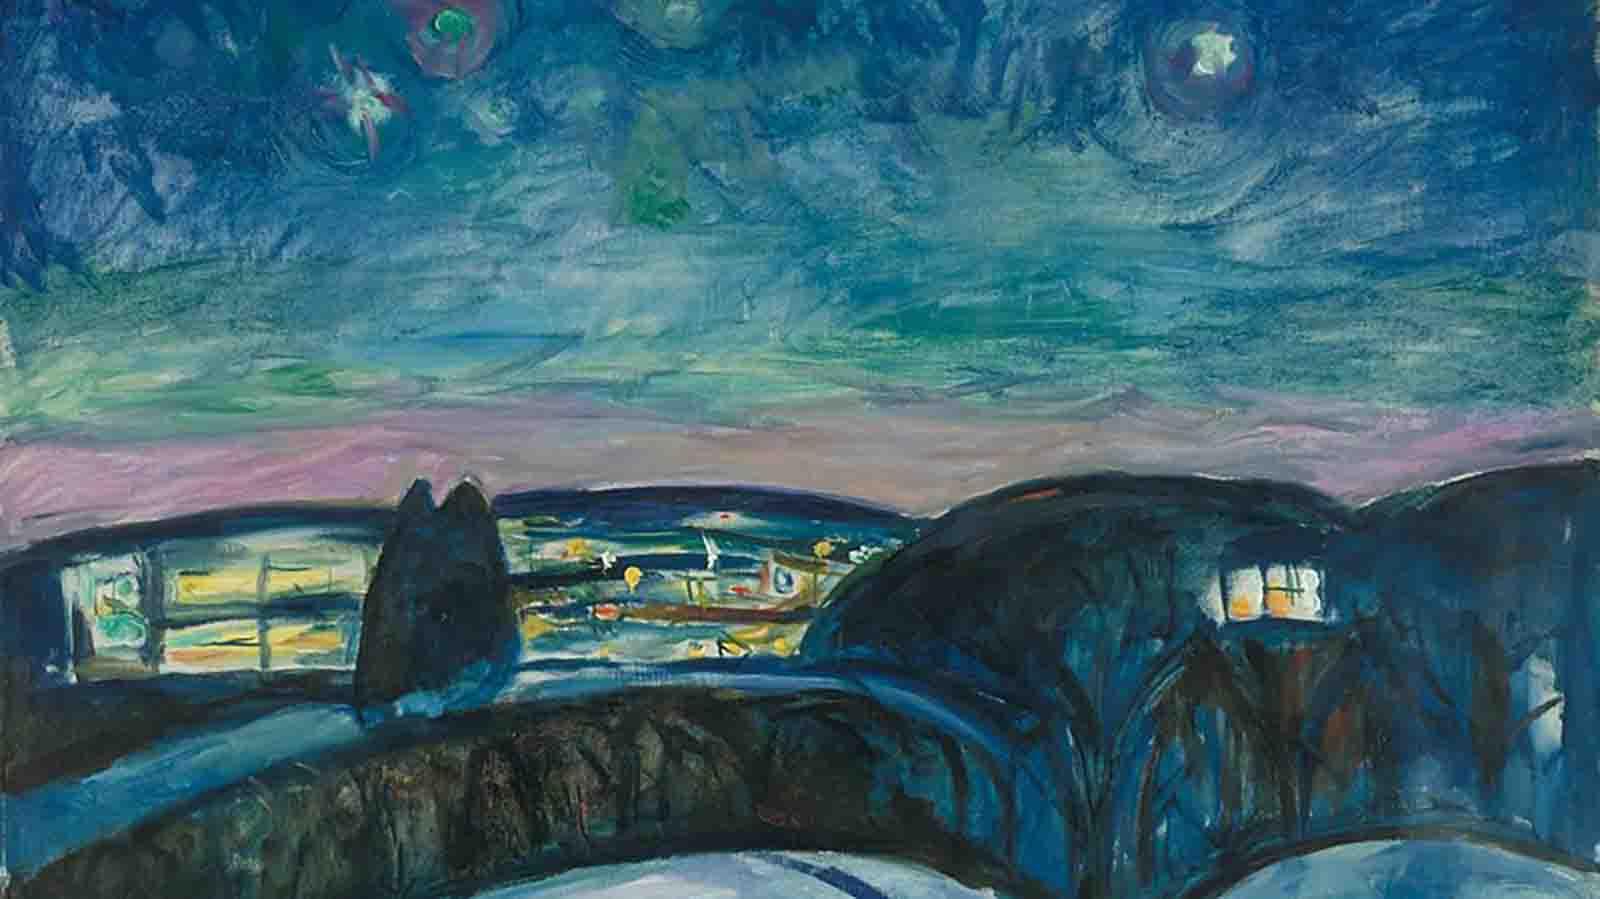 C3 - Astronomía y arte - Starry_Night_by_Edvard_Munch_1893_Getty_Center